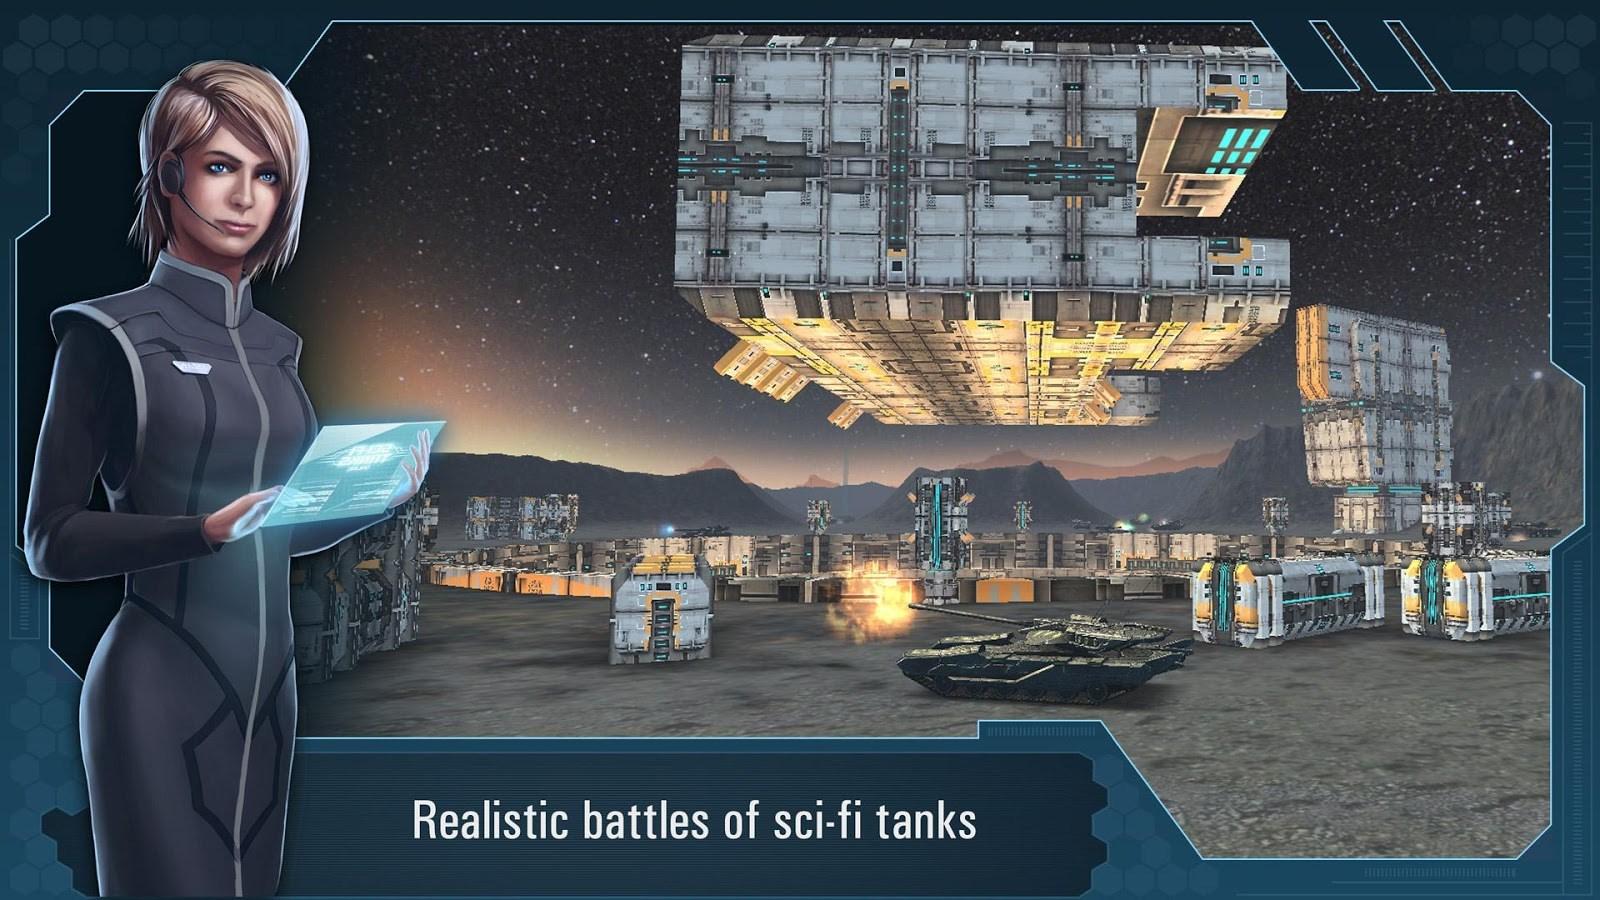 Future Tanks: 3D Online Battle - Imagem 1 do software